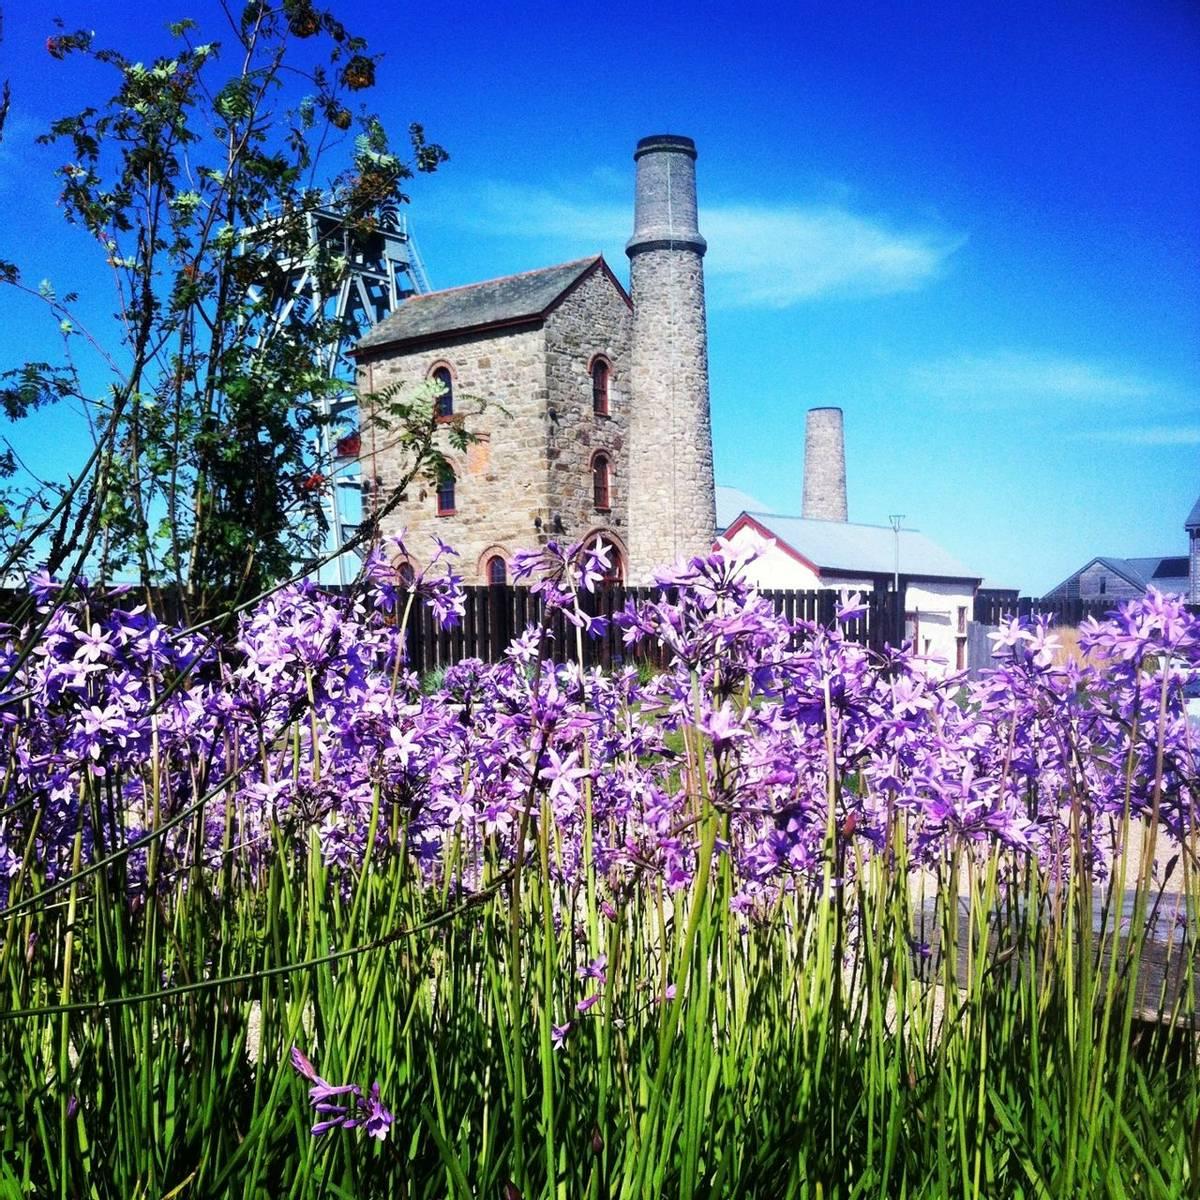 Cornwall - Hidden Gardens of Cornwall - Heartlands - gardens 3.JPG